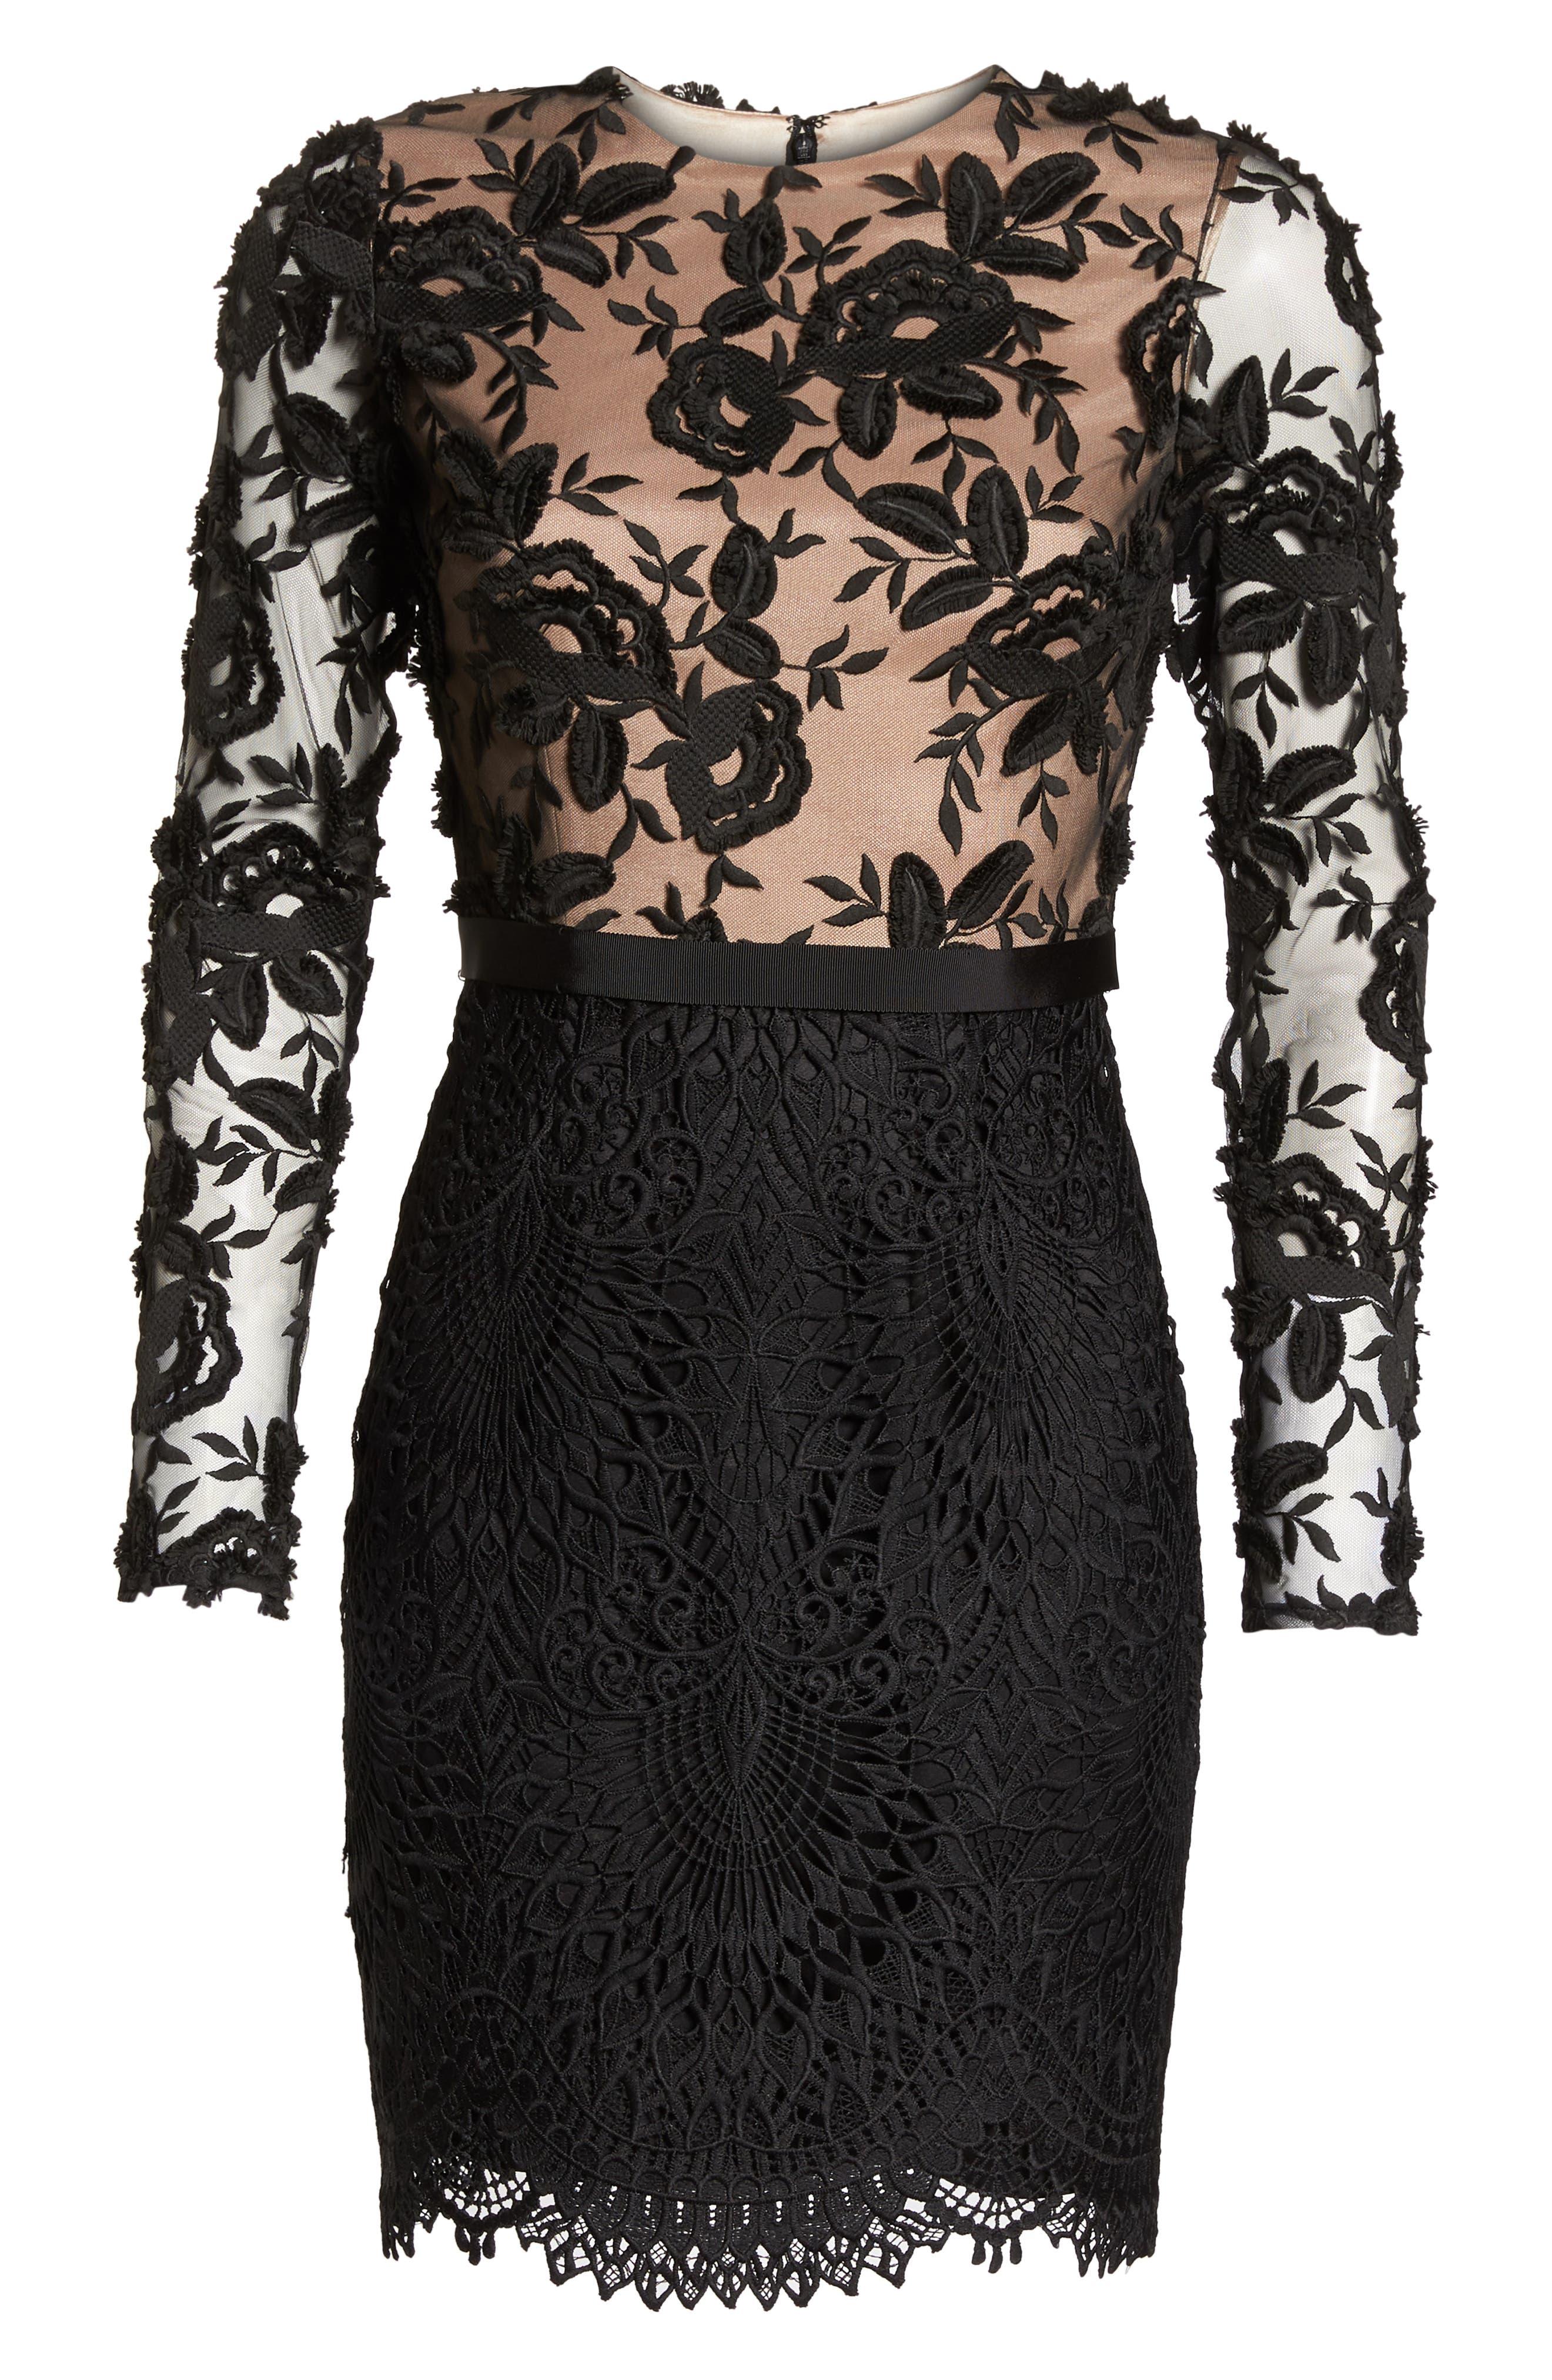 Calypso Lace Sheath Dress,                             Alternate thumbnail 7, color,                             BLACK/ NUDE